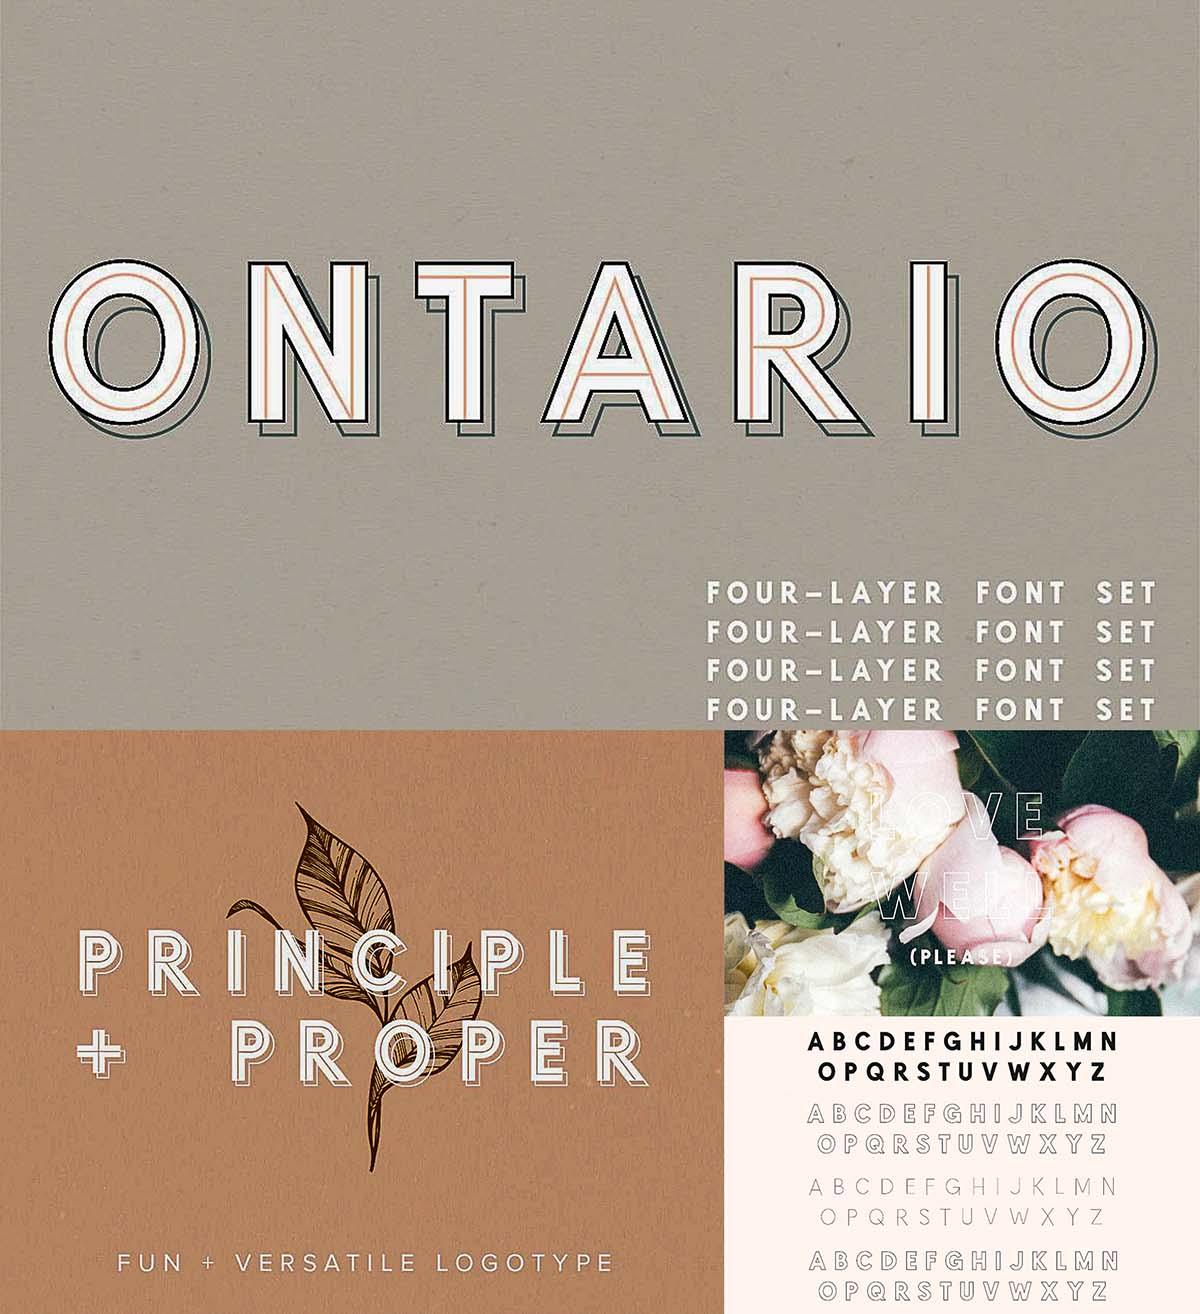 Ontario typeface